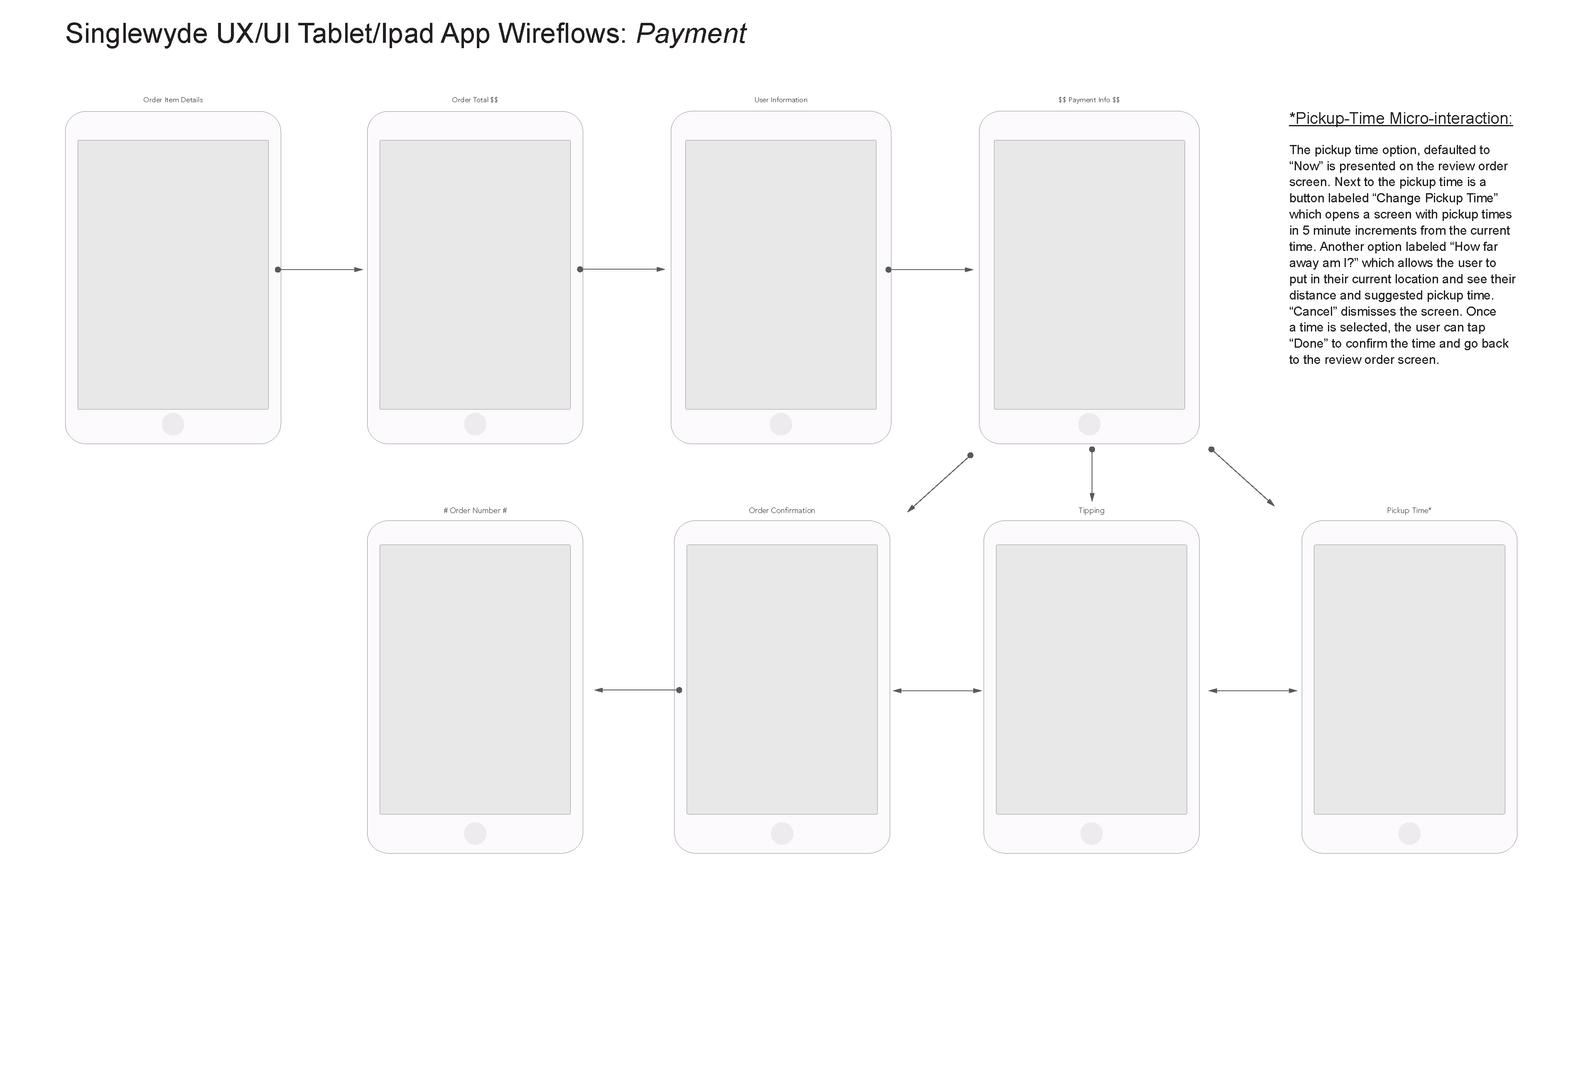 Singlewyde TABLET-IPAD Wireframes_Page_2